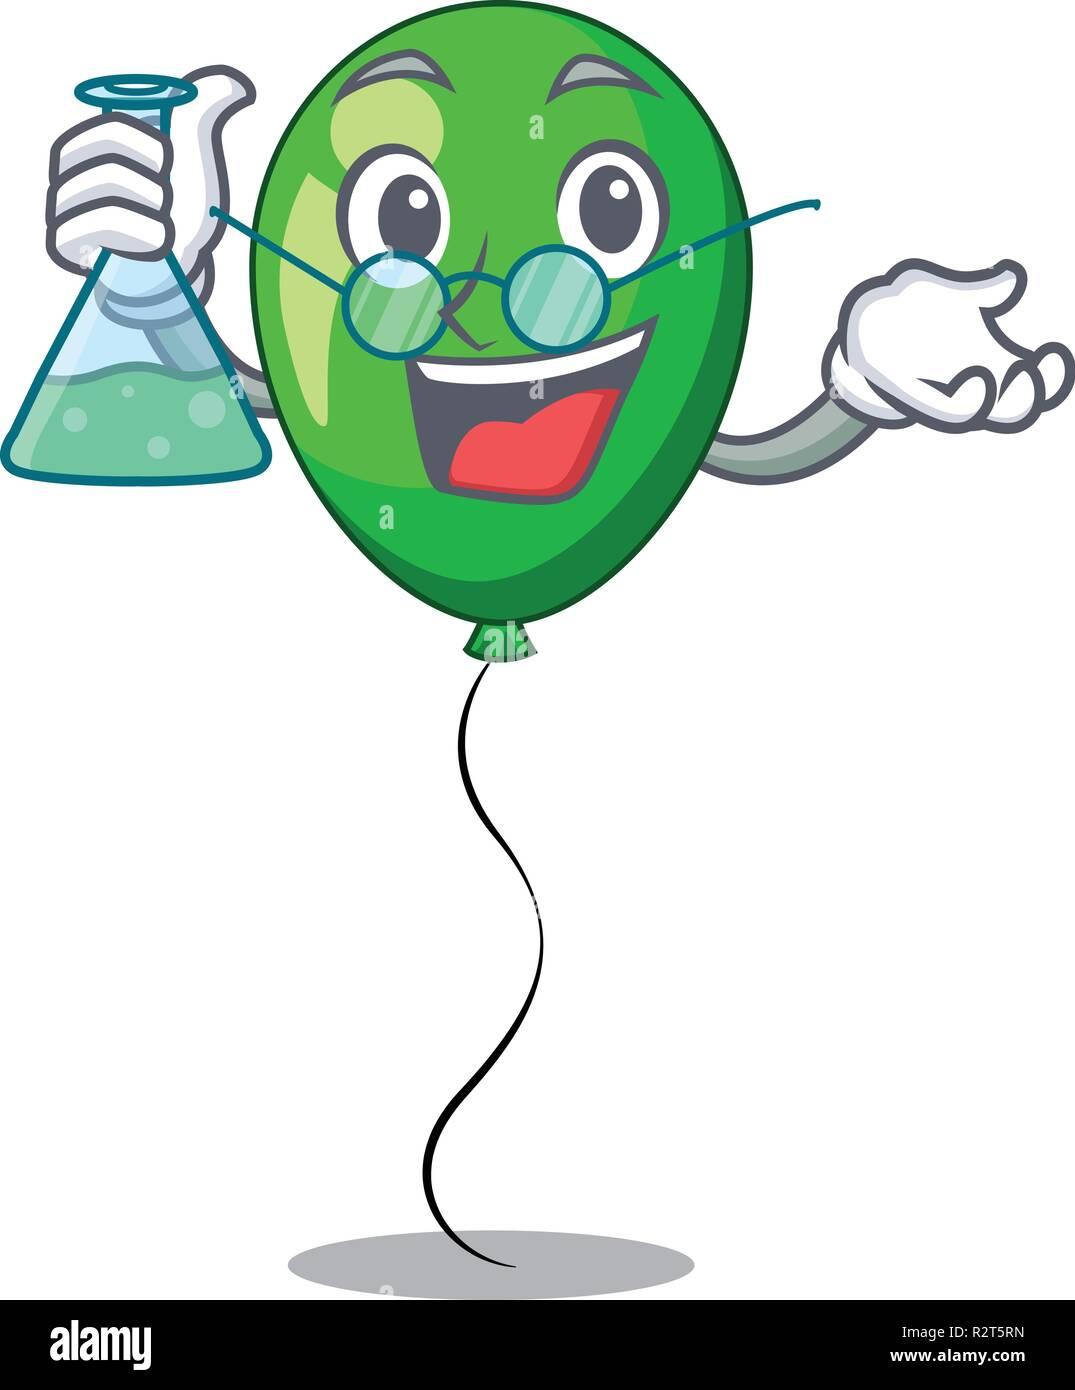 Professor green baloon on left corner mascot - Stock Vector